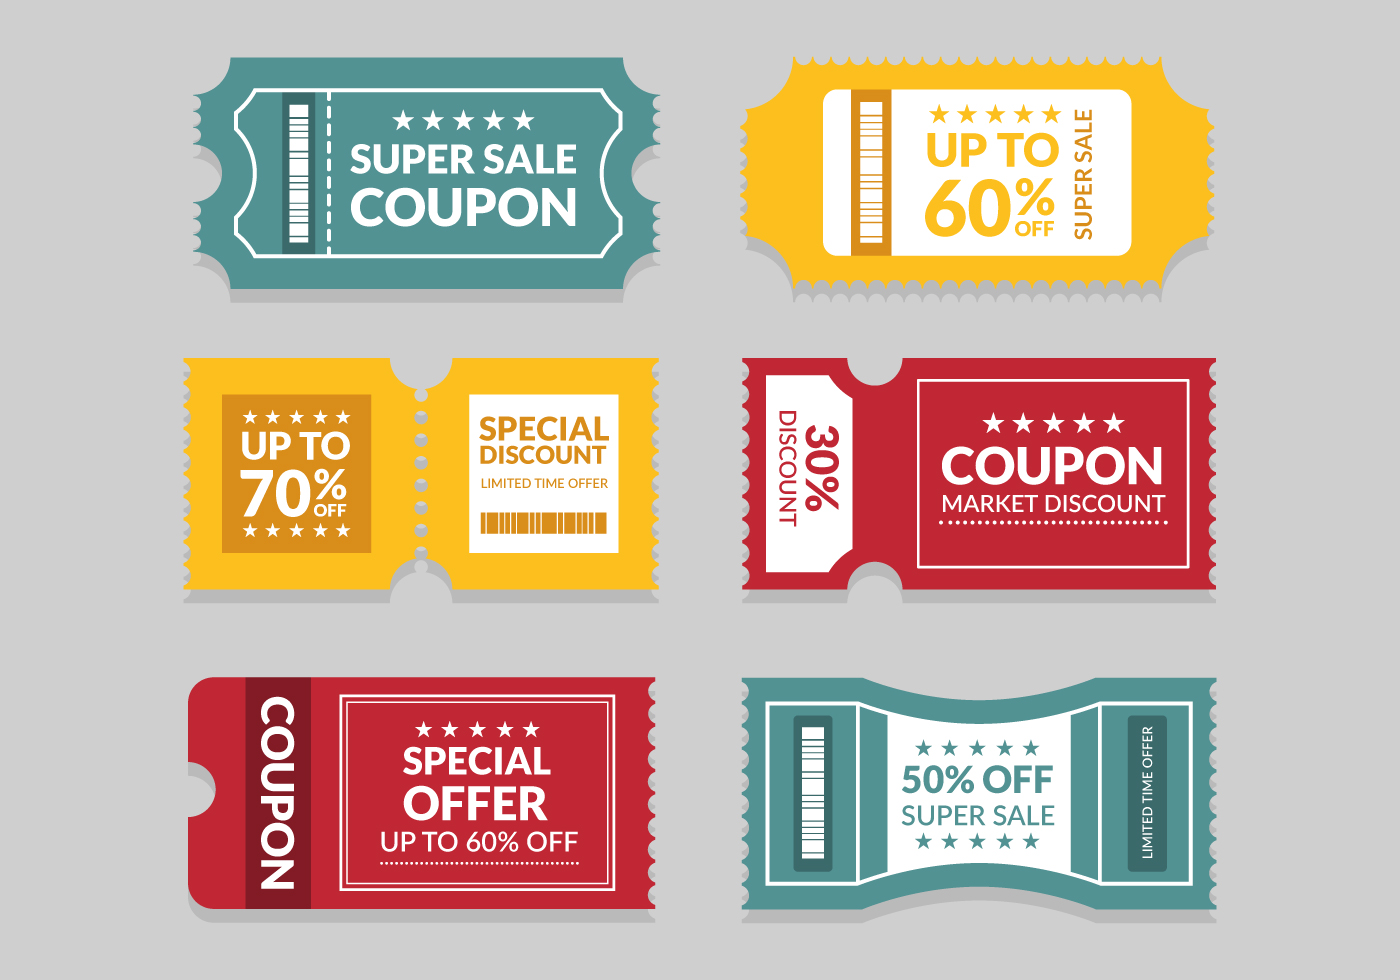 coupon template 272527 vector art at vecteezy